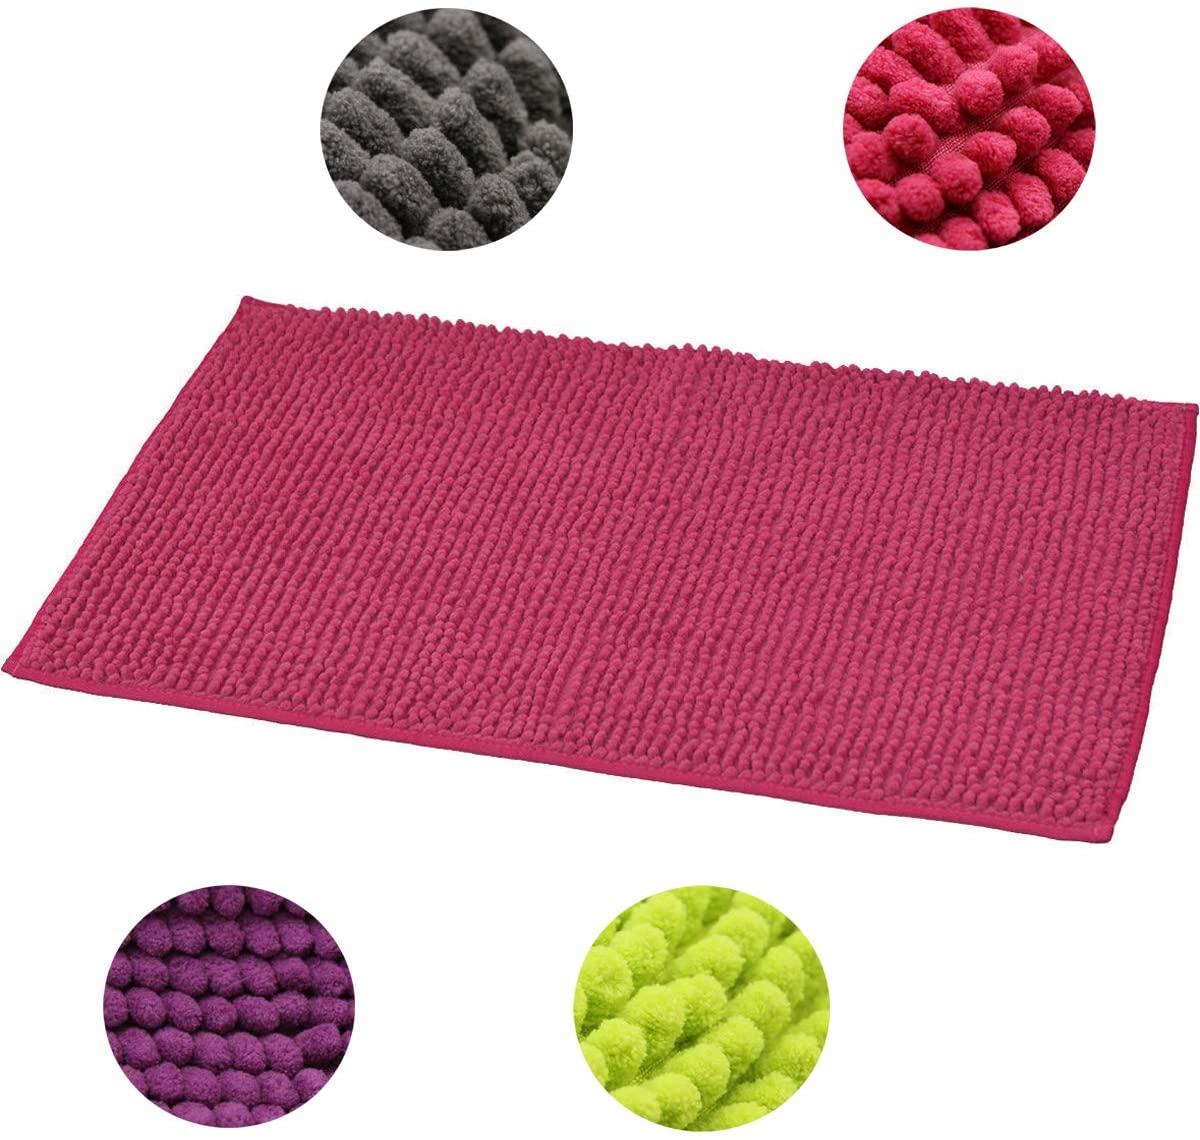 EVIDECO Soft Microfiber Area Polyester Luxurious Balls Mat Bath Rug, 7707150, Pink